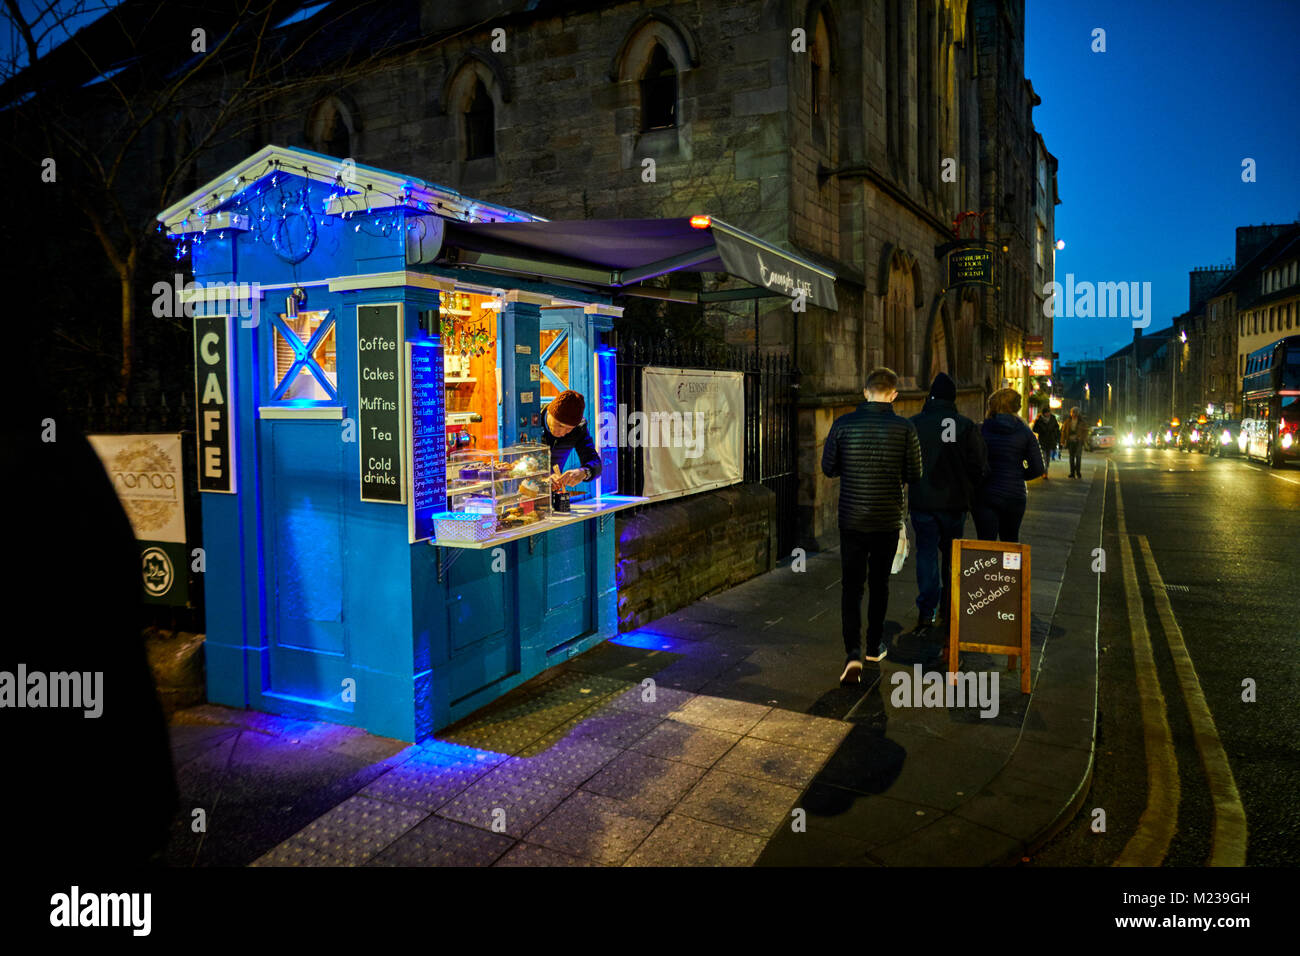 Edinburgh capital city of Scotland,  historic landmark royal mile, and old police box reused as a small cafe - Stock Image